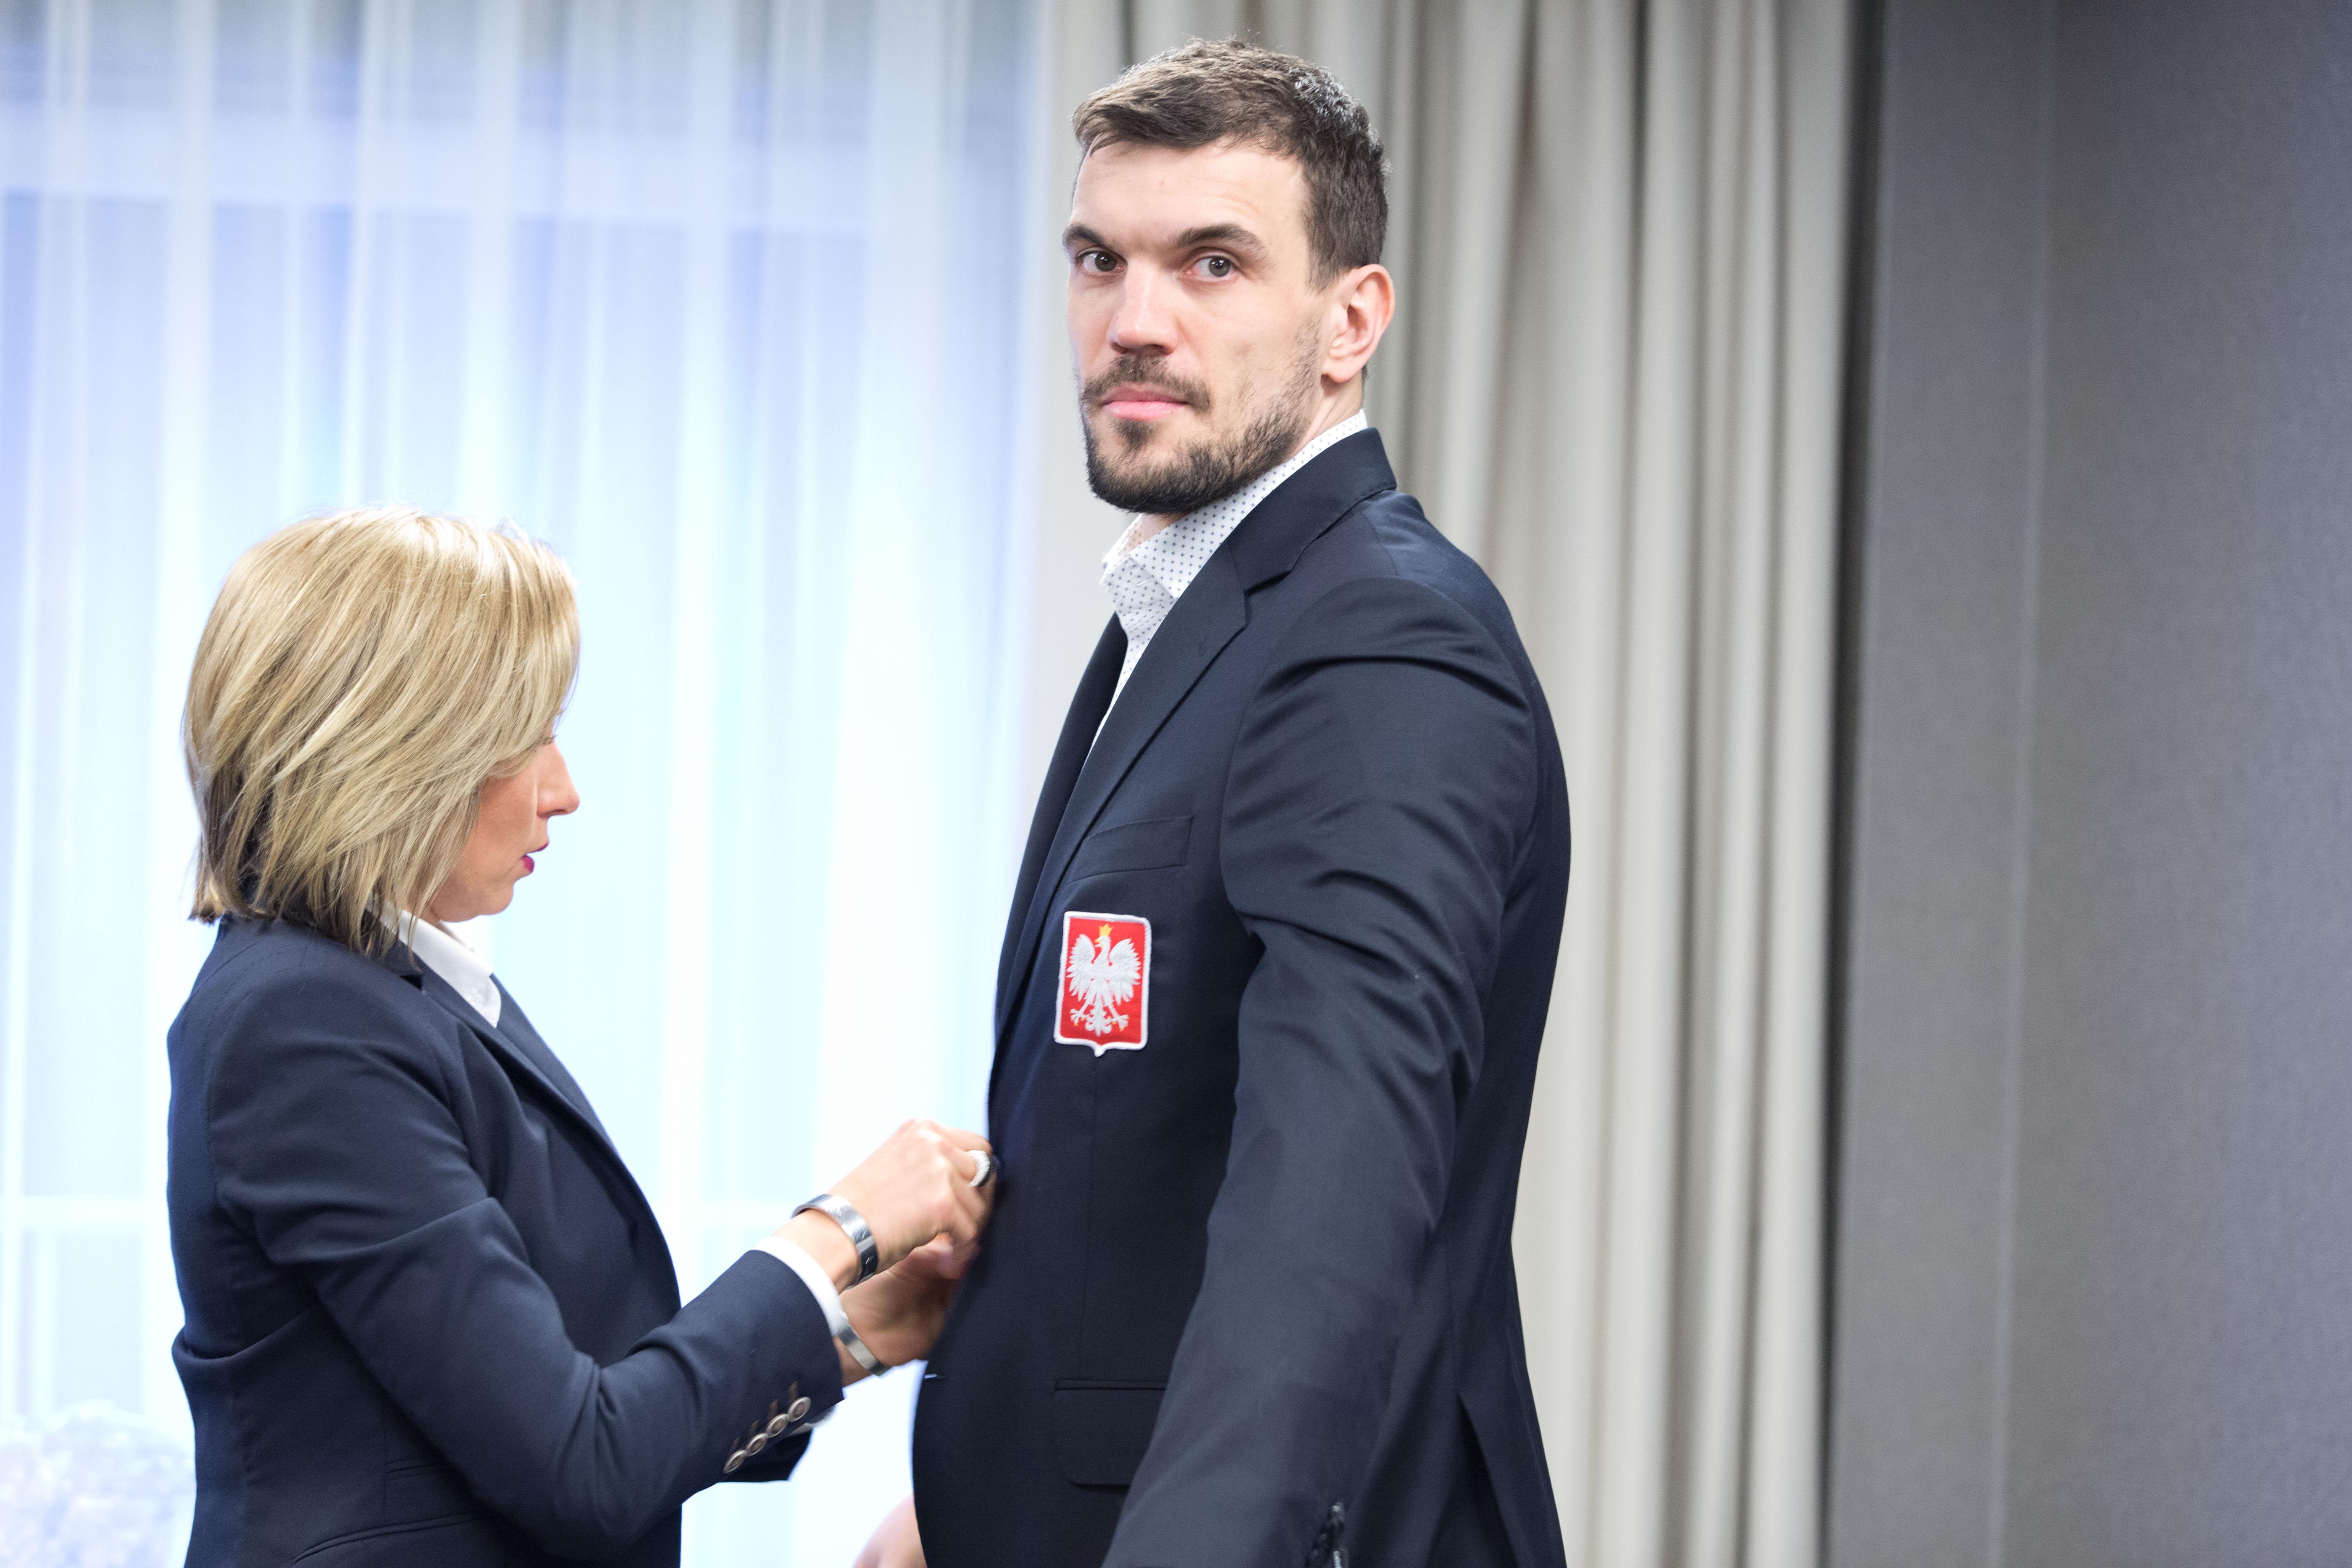 Reprezentacja Polski w garniturach Lancerto